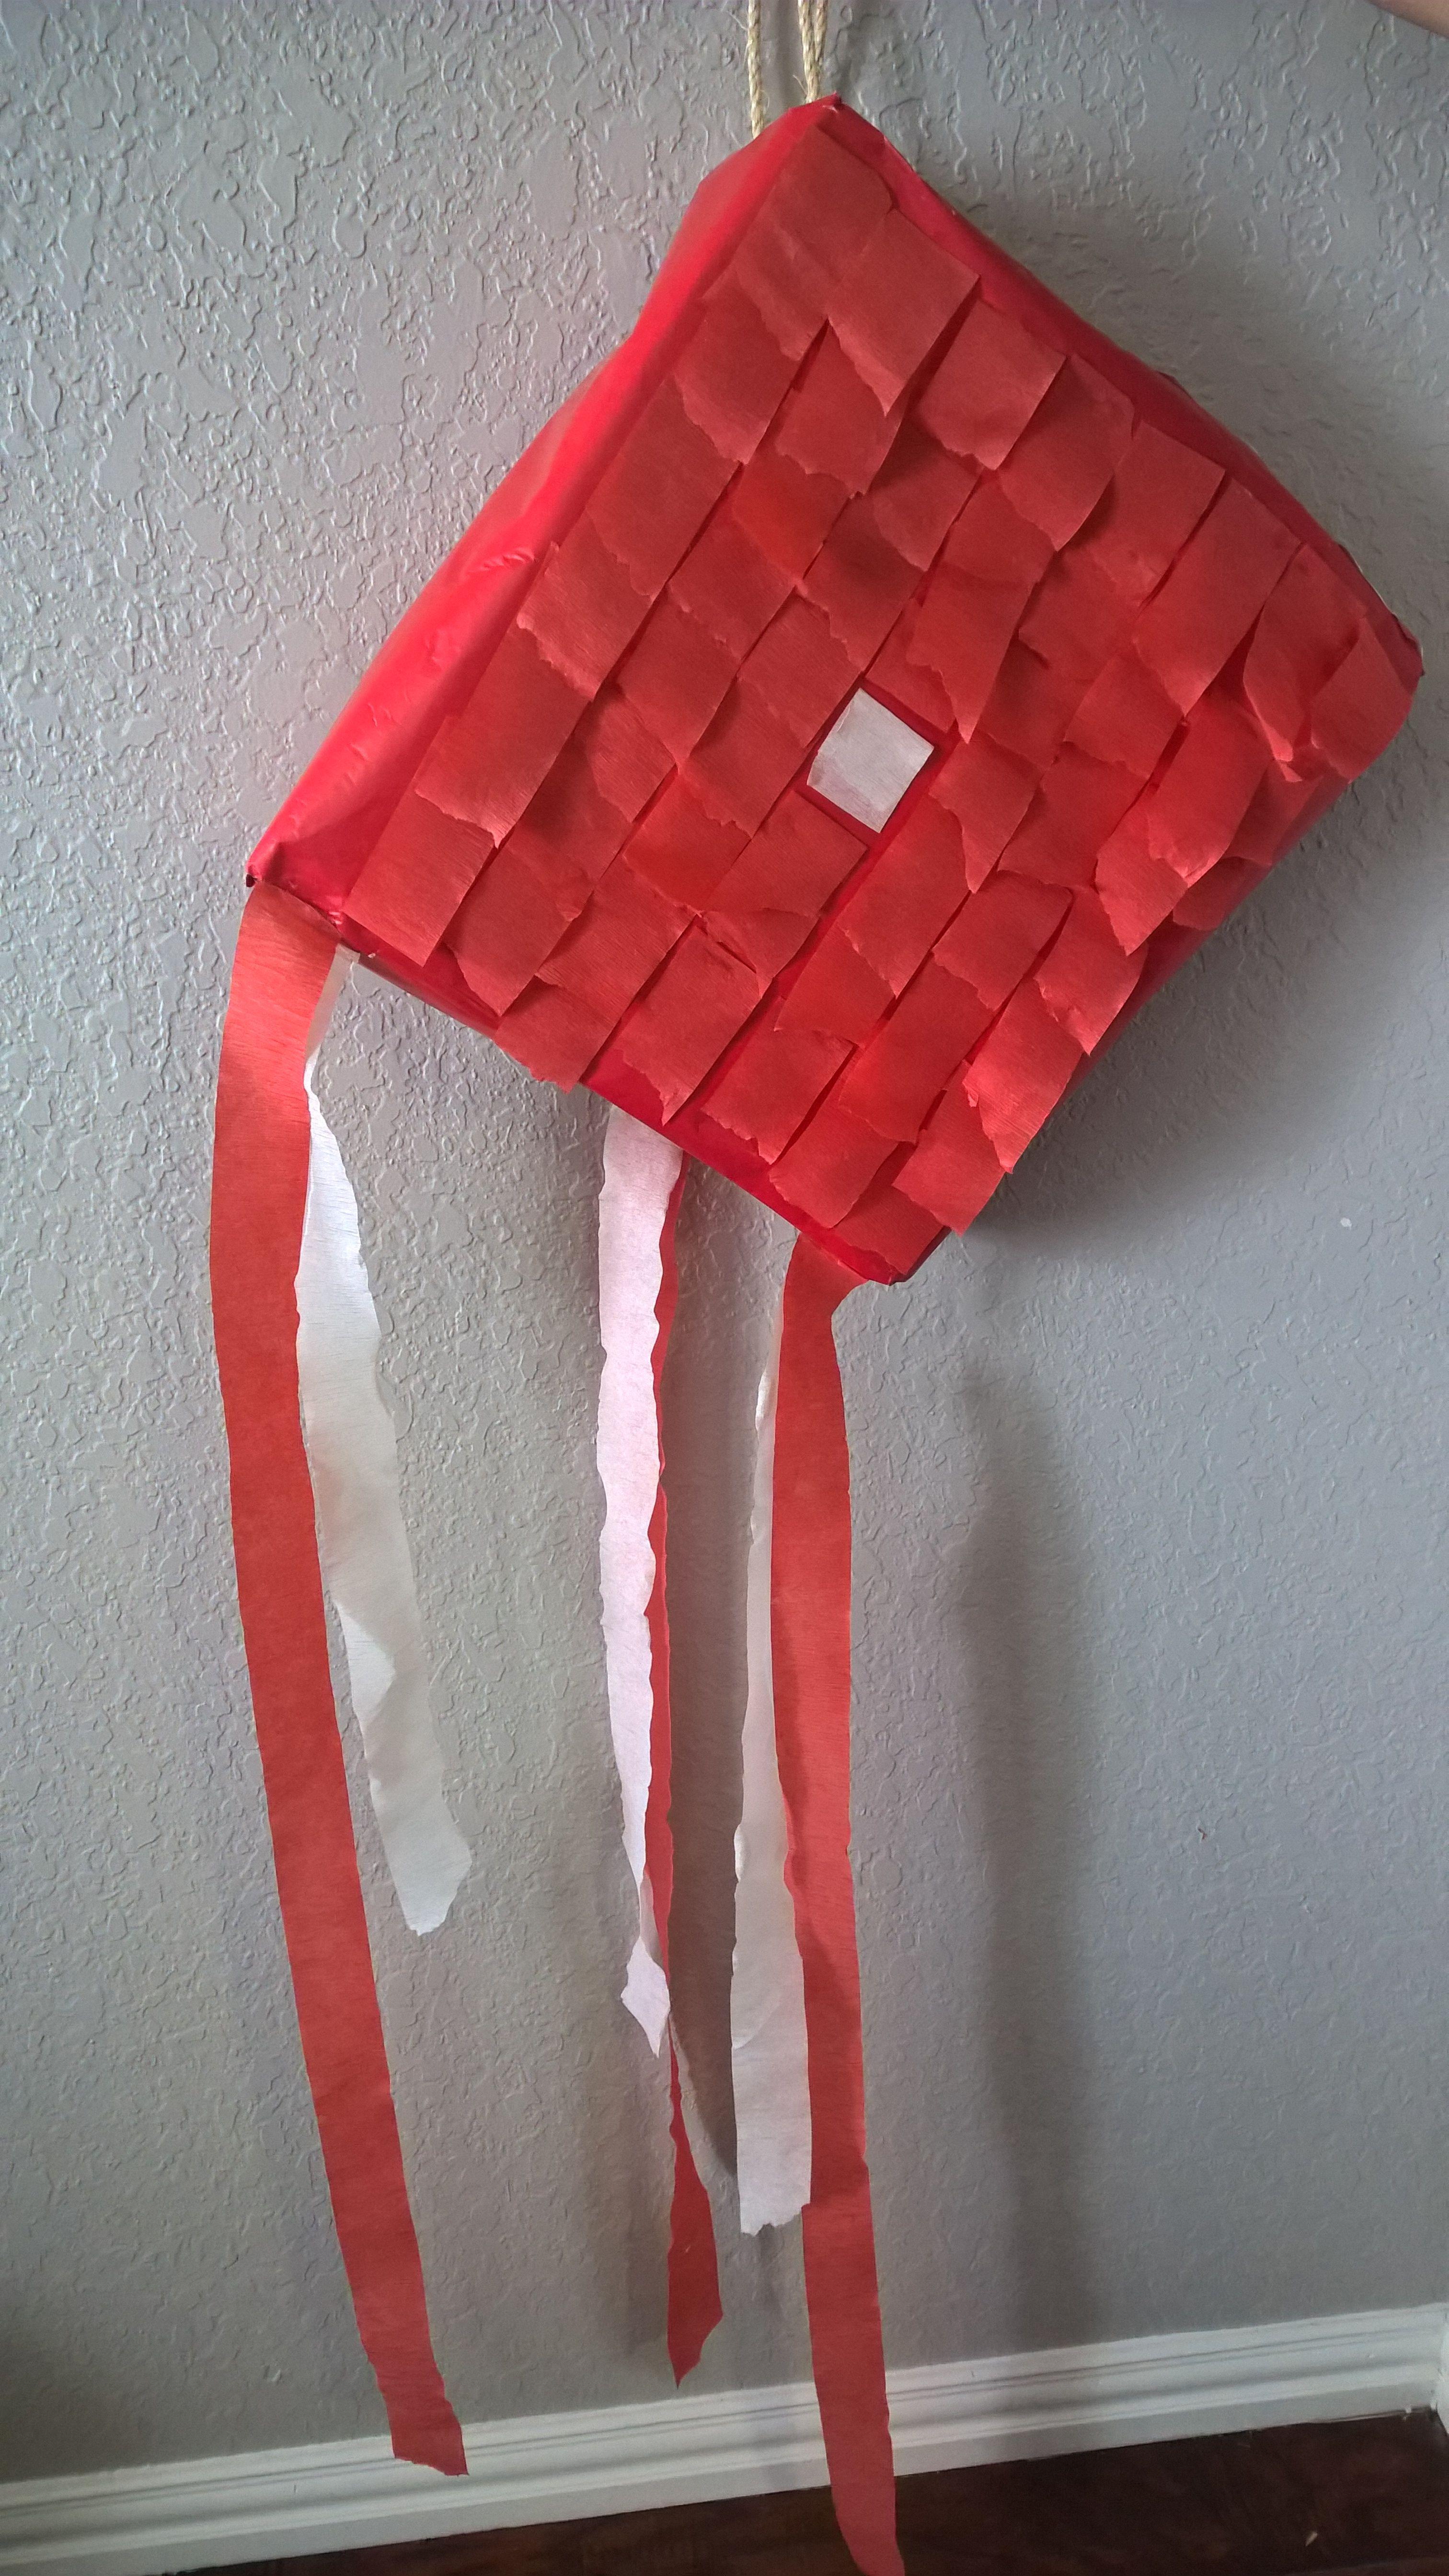 Roblox Piñata Birthday parties, Roblox, Party time